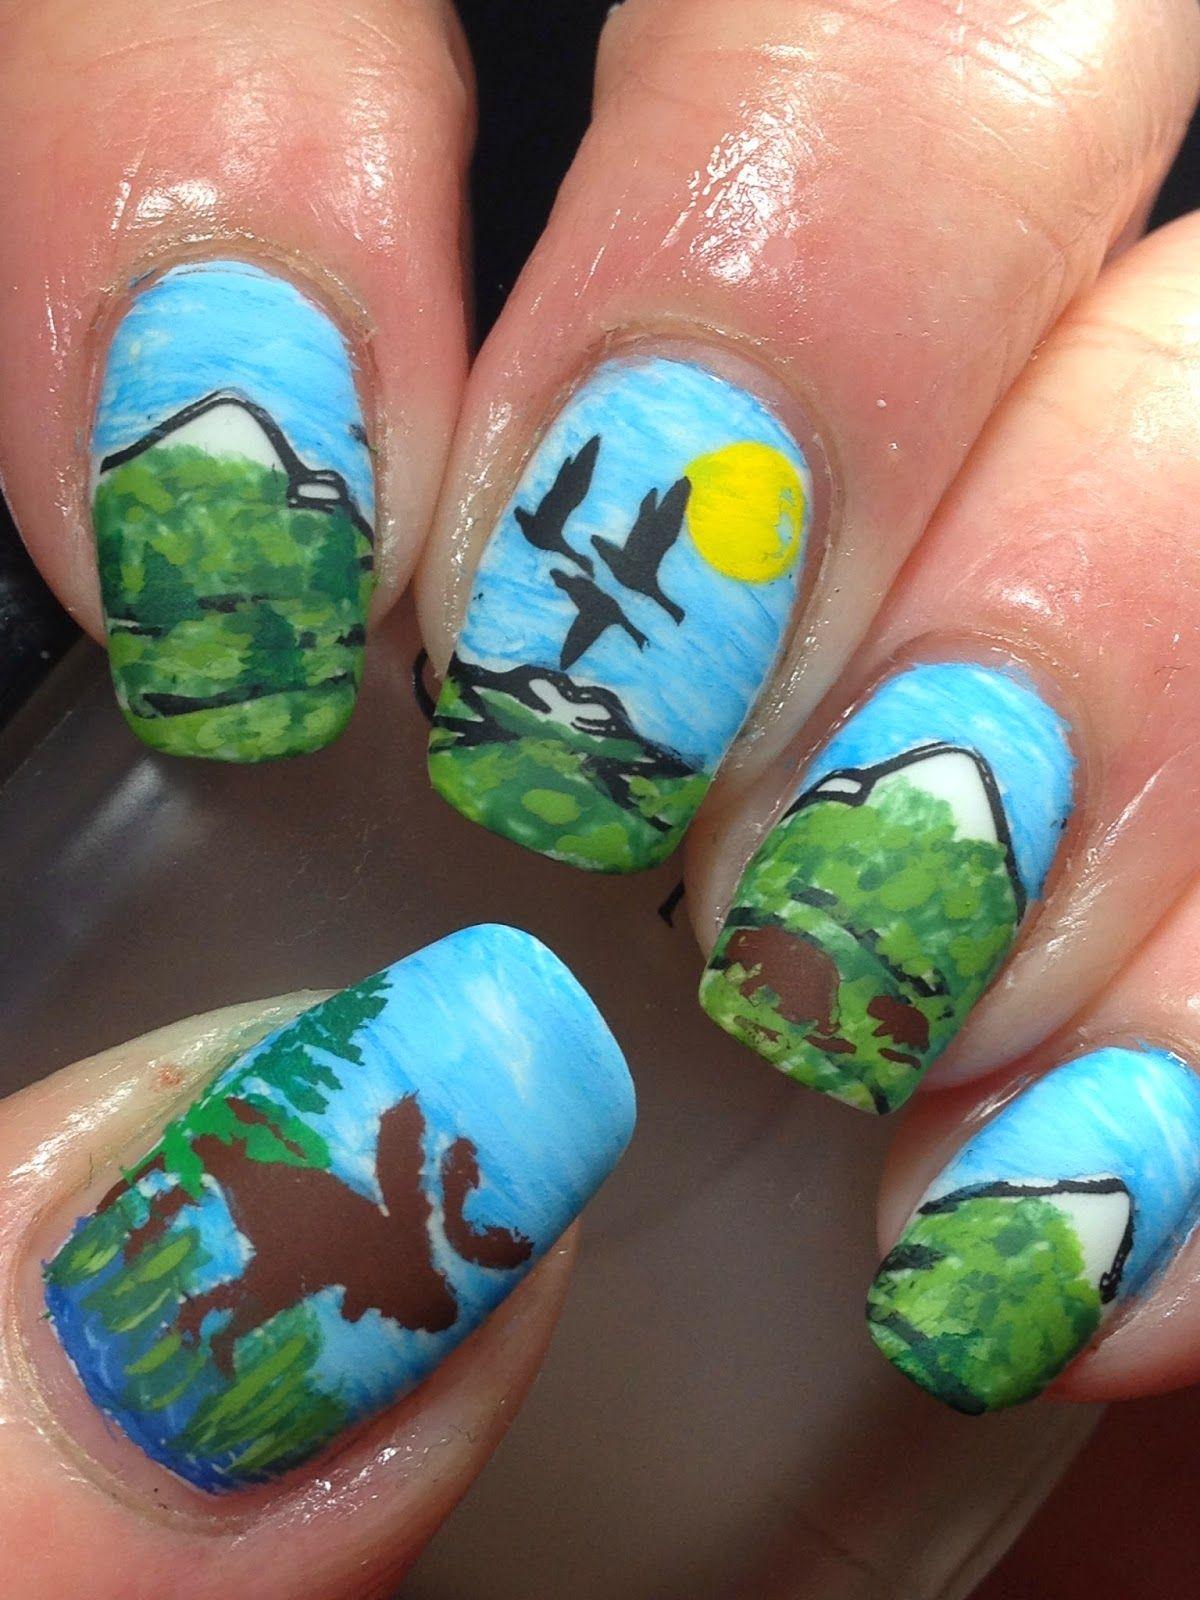 Scenic Nature Nails Nails Pinterest Fancy Nail Art Opi And